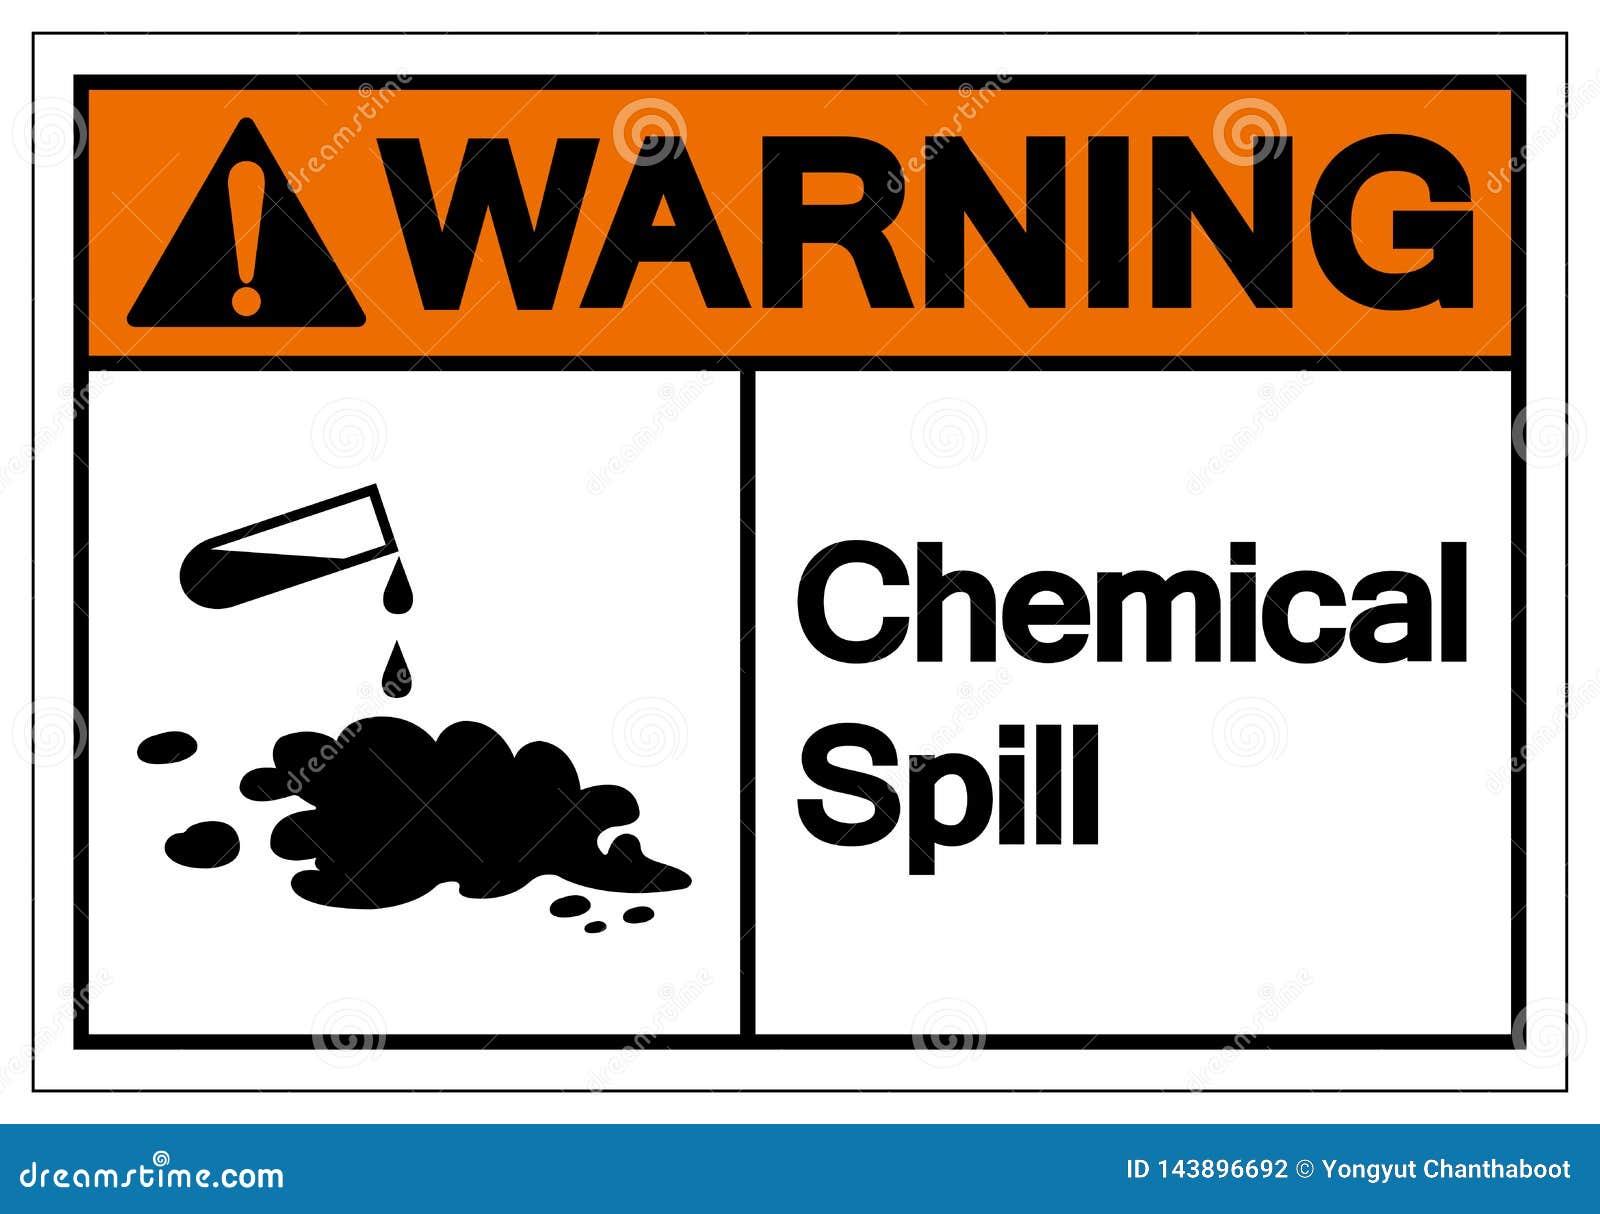 Warning Chemical Spill Symbol Sign, Vector Illustration, Isolate On White Background Label. EPS10